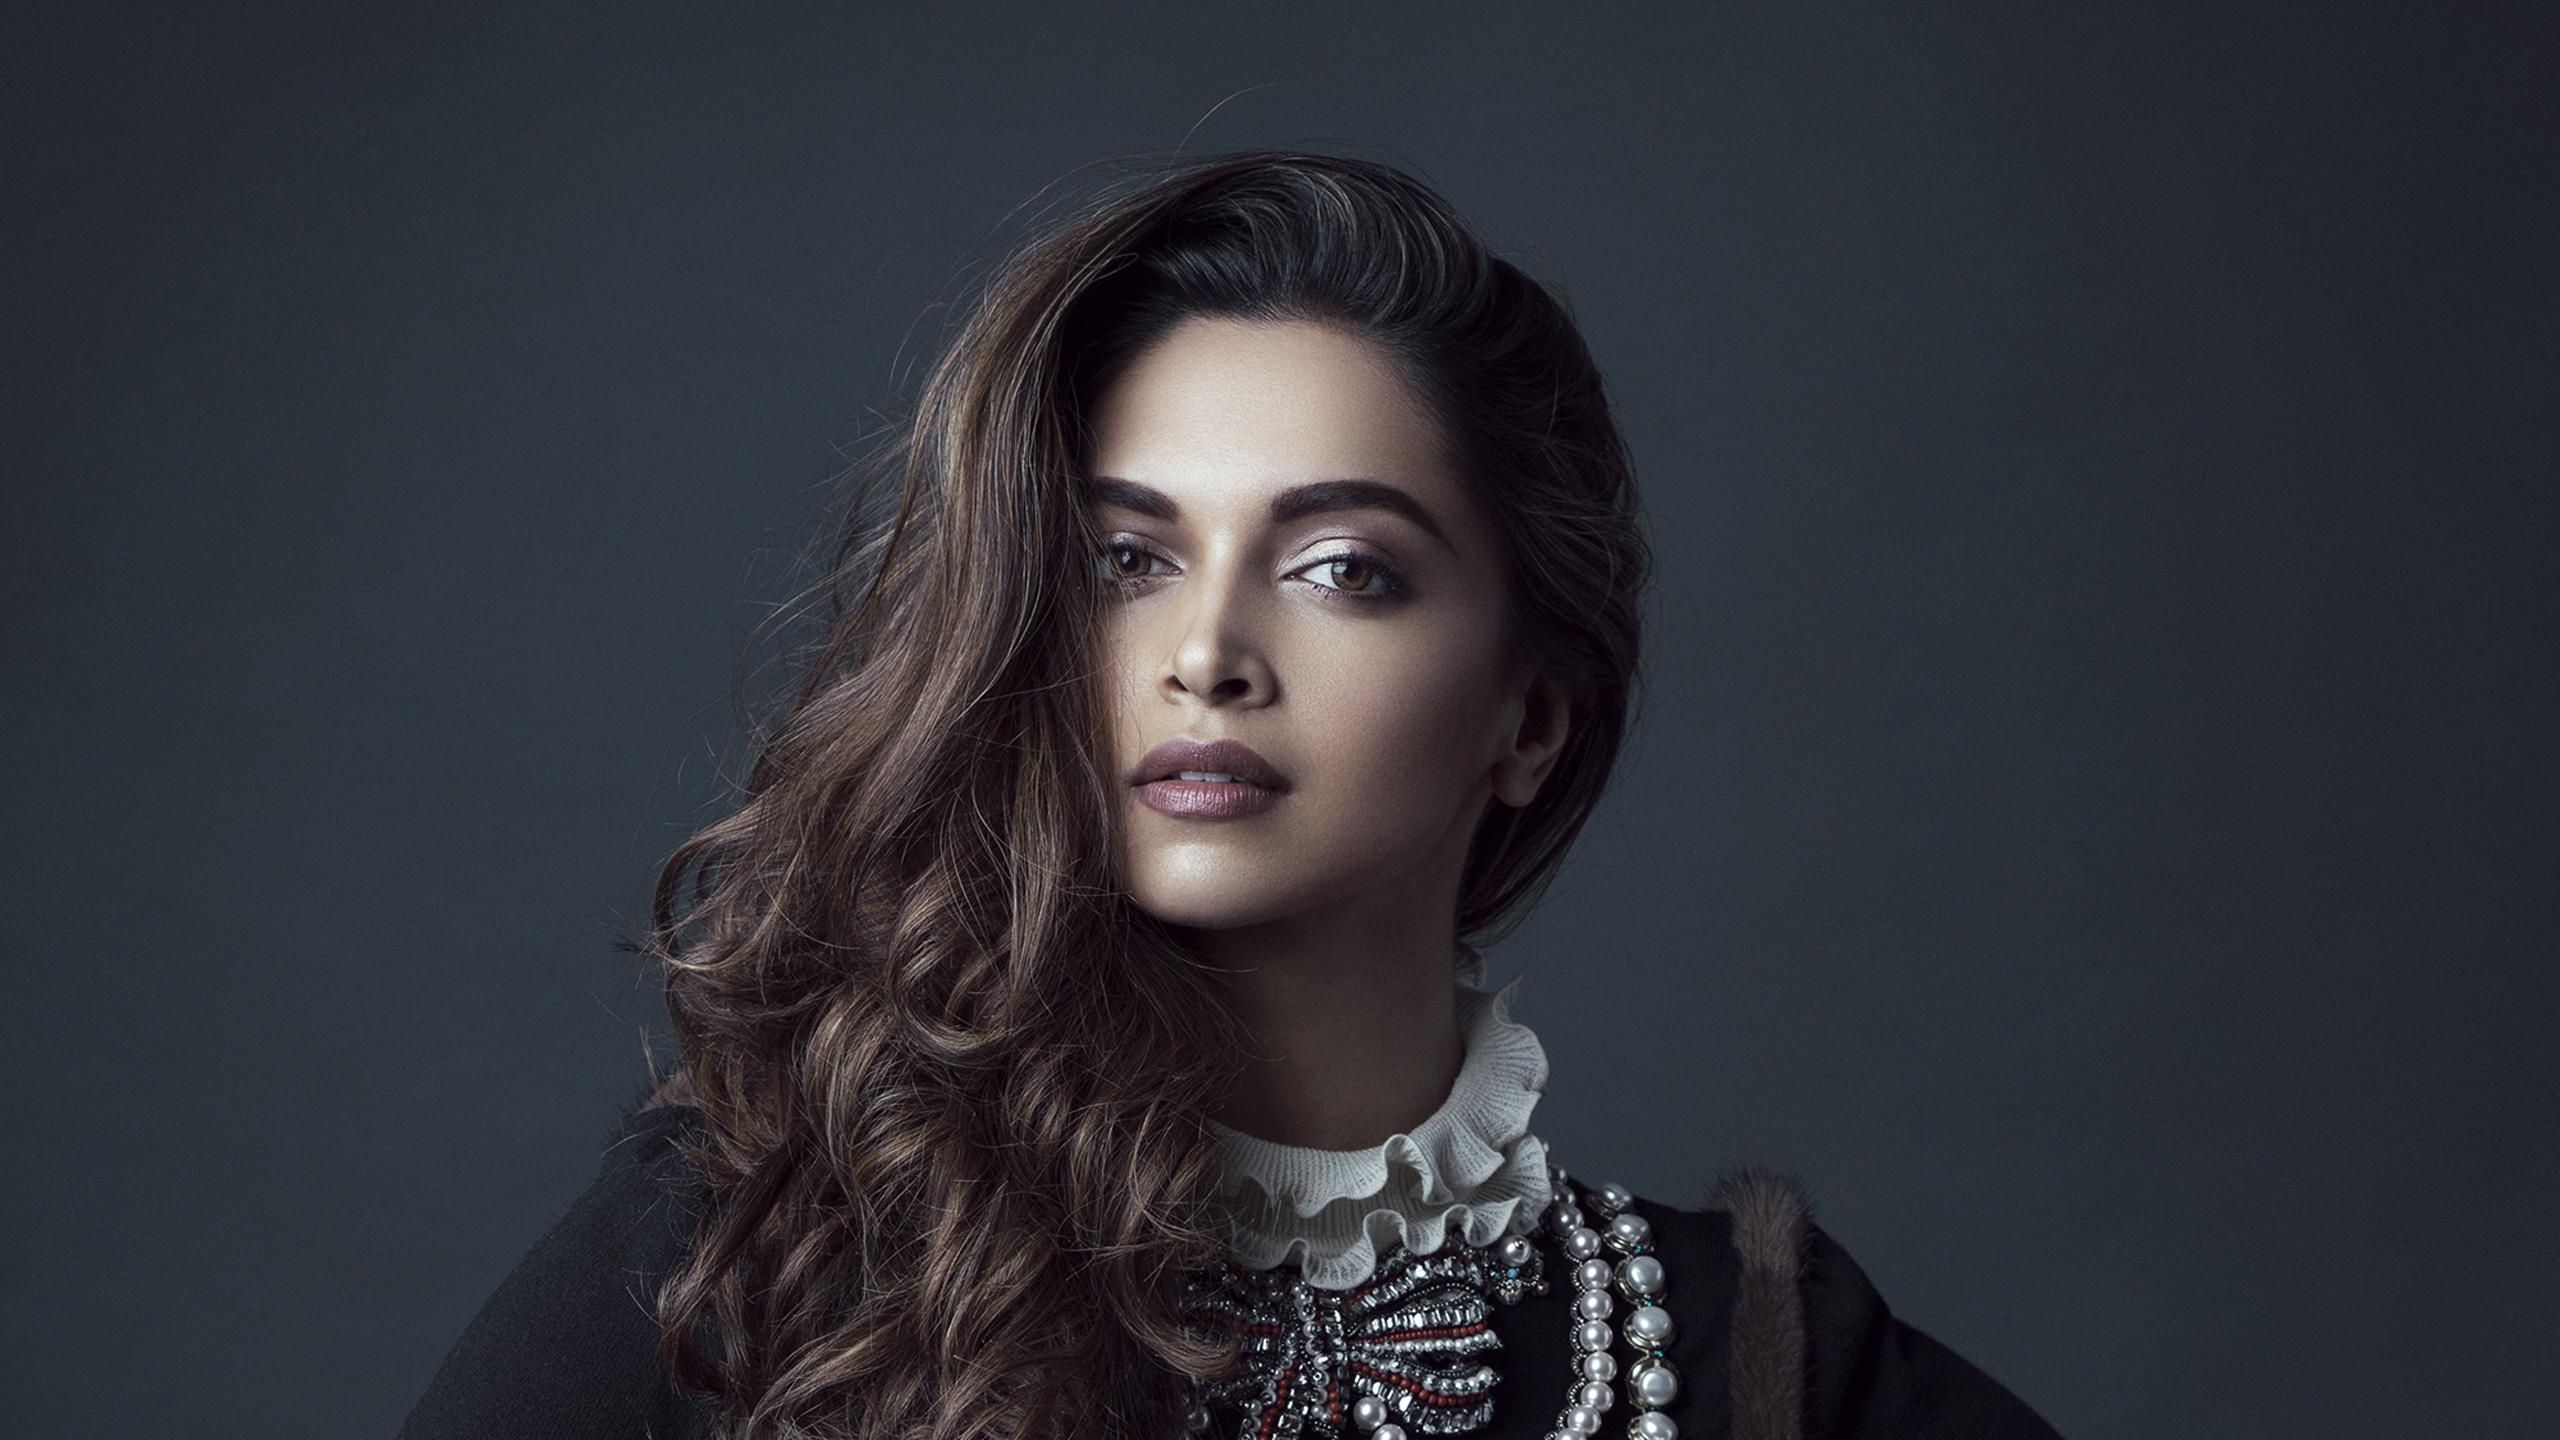 2016 deepika padukone 1, hd indian celebrities, 4k wallpapers